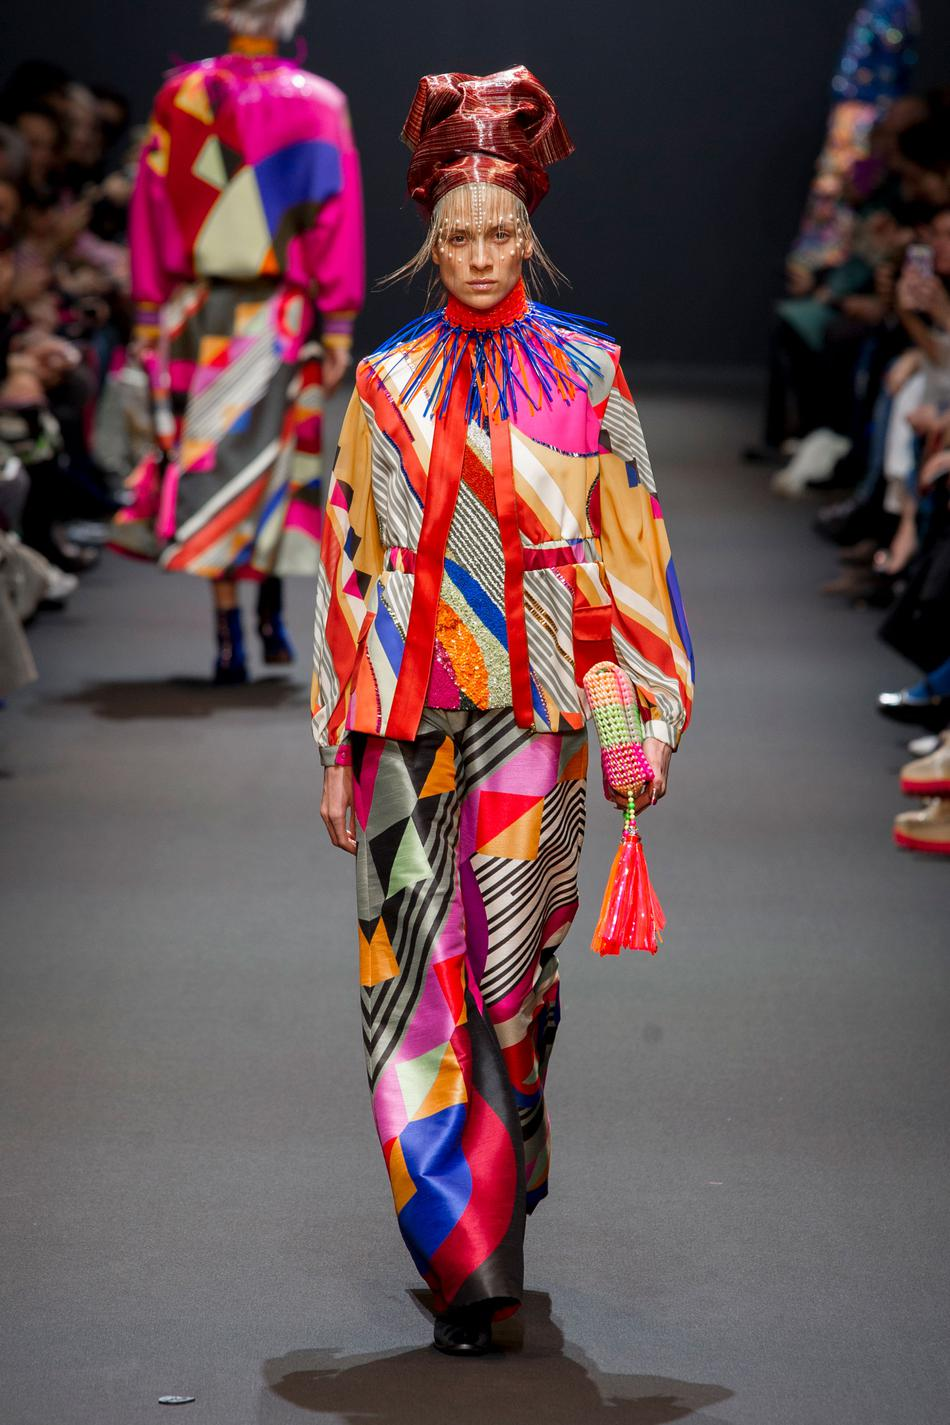 Défilé Manish Arora Fashion Week 2017 - Look 17